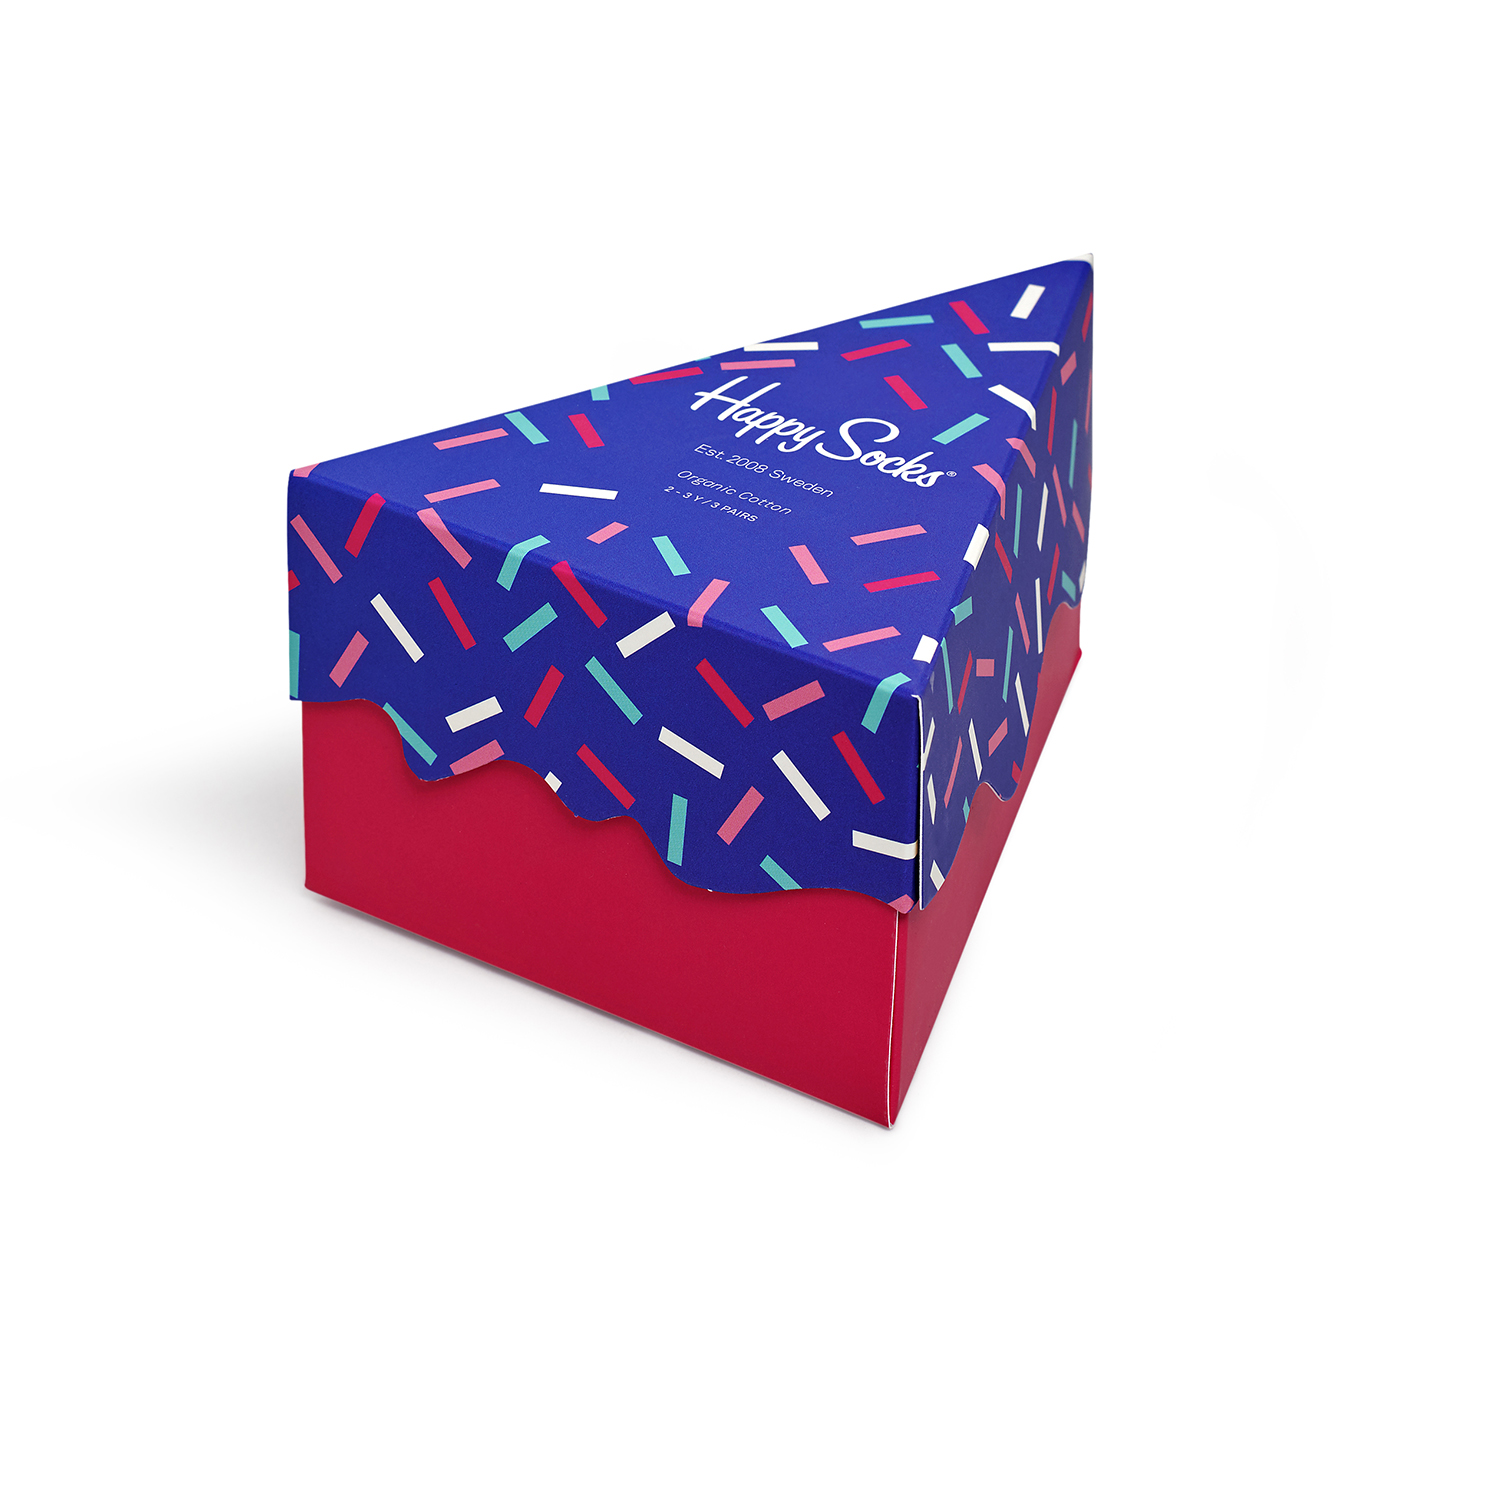 Happy Socks – Kids Happy Birthday 3 Pack Sock Set in Cake Shaped Gift Box